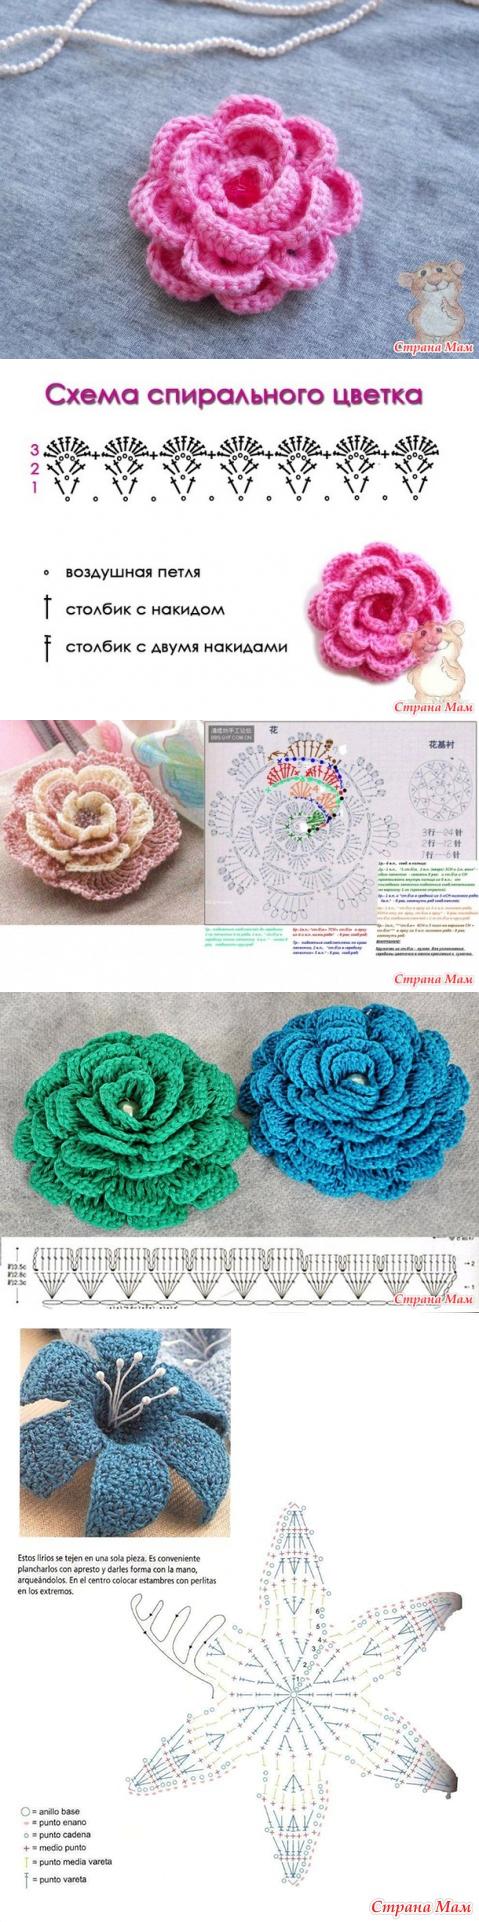 Pin de Ely Campo en flores en croché | Pinterest | Las flores, Mamá ...